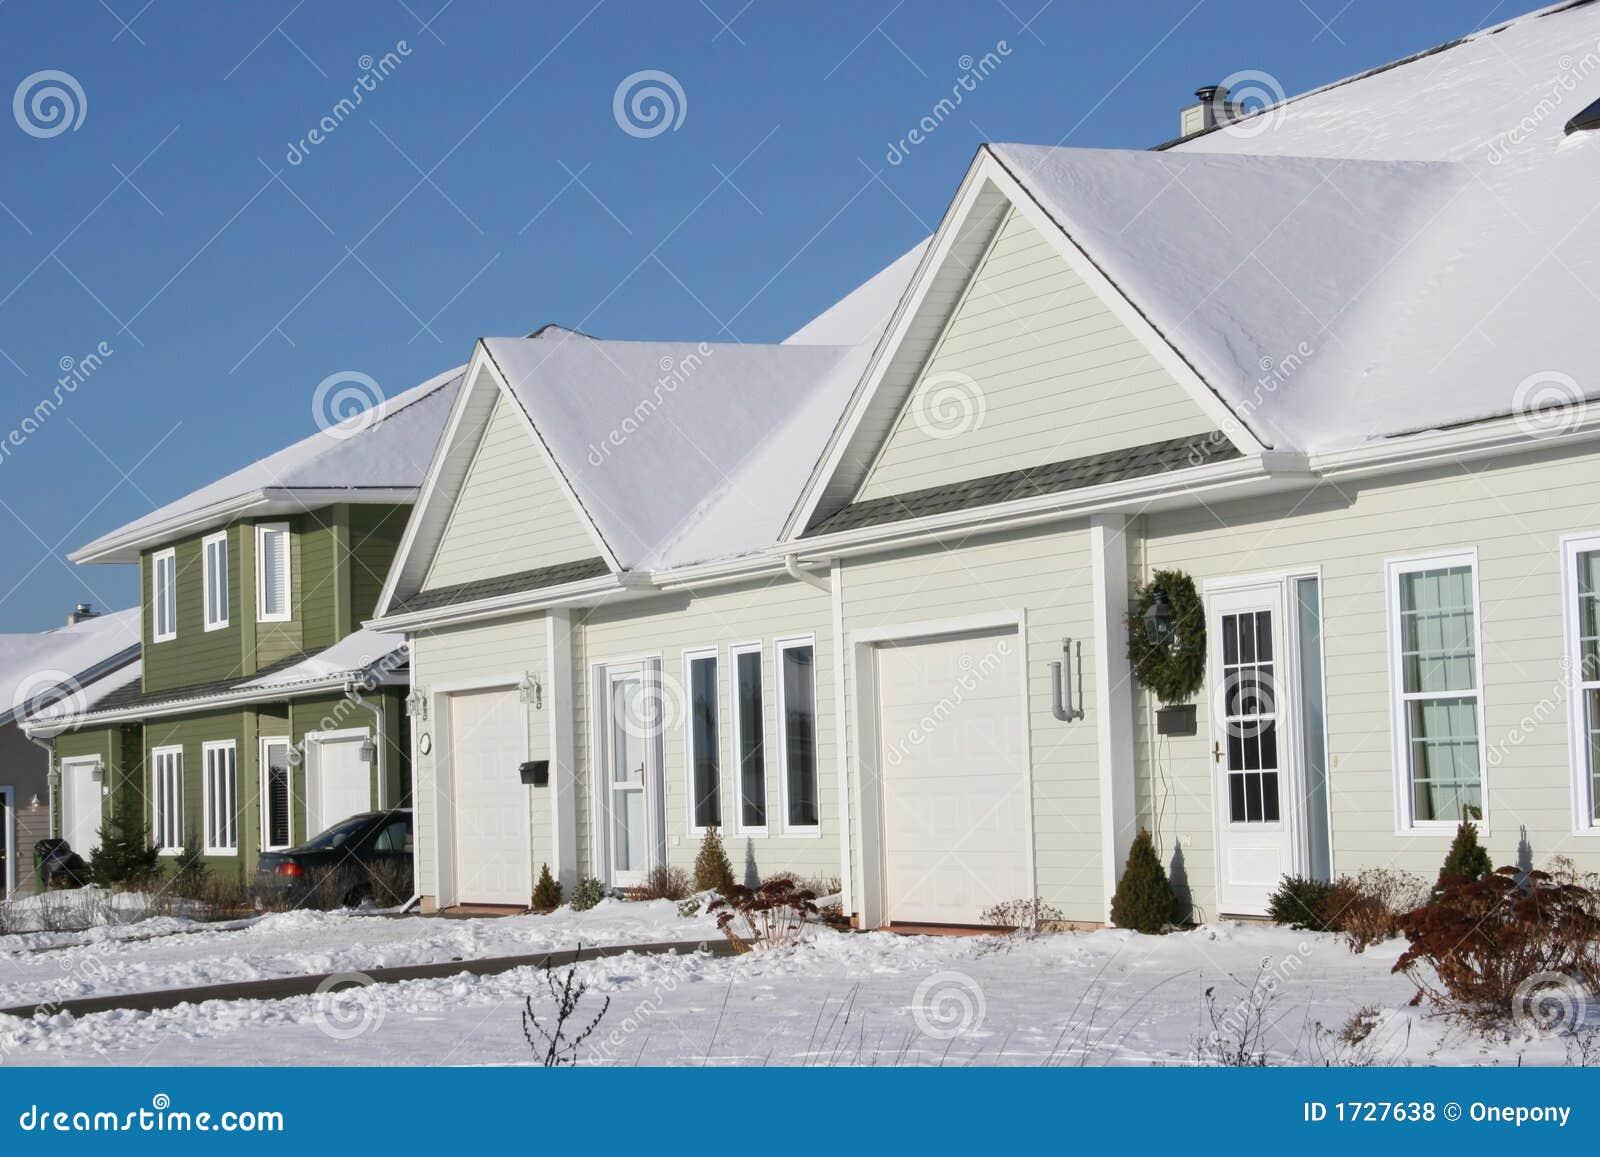 Wondrous Snowy Townhouses Stock Photo Image Of Freeze Driveway Interior Design Ideas Skatsoteloinfo